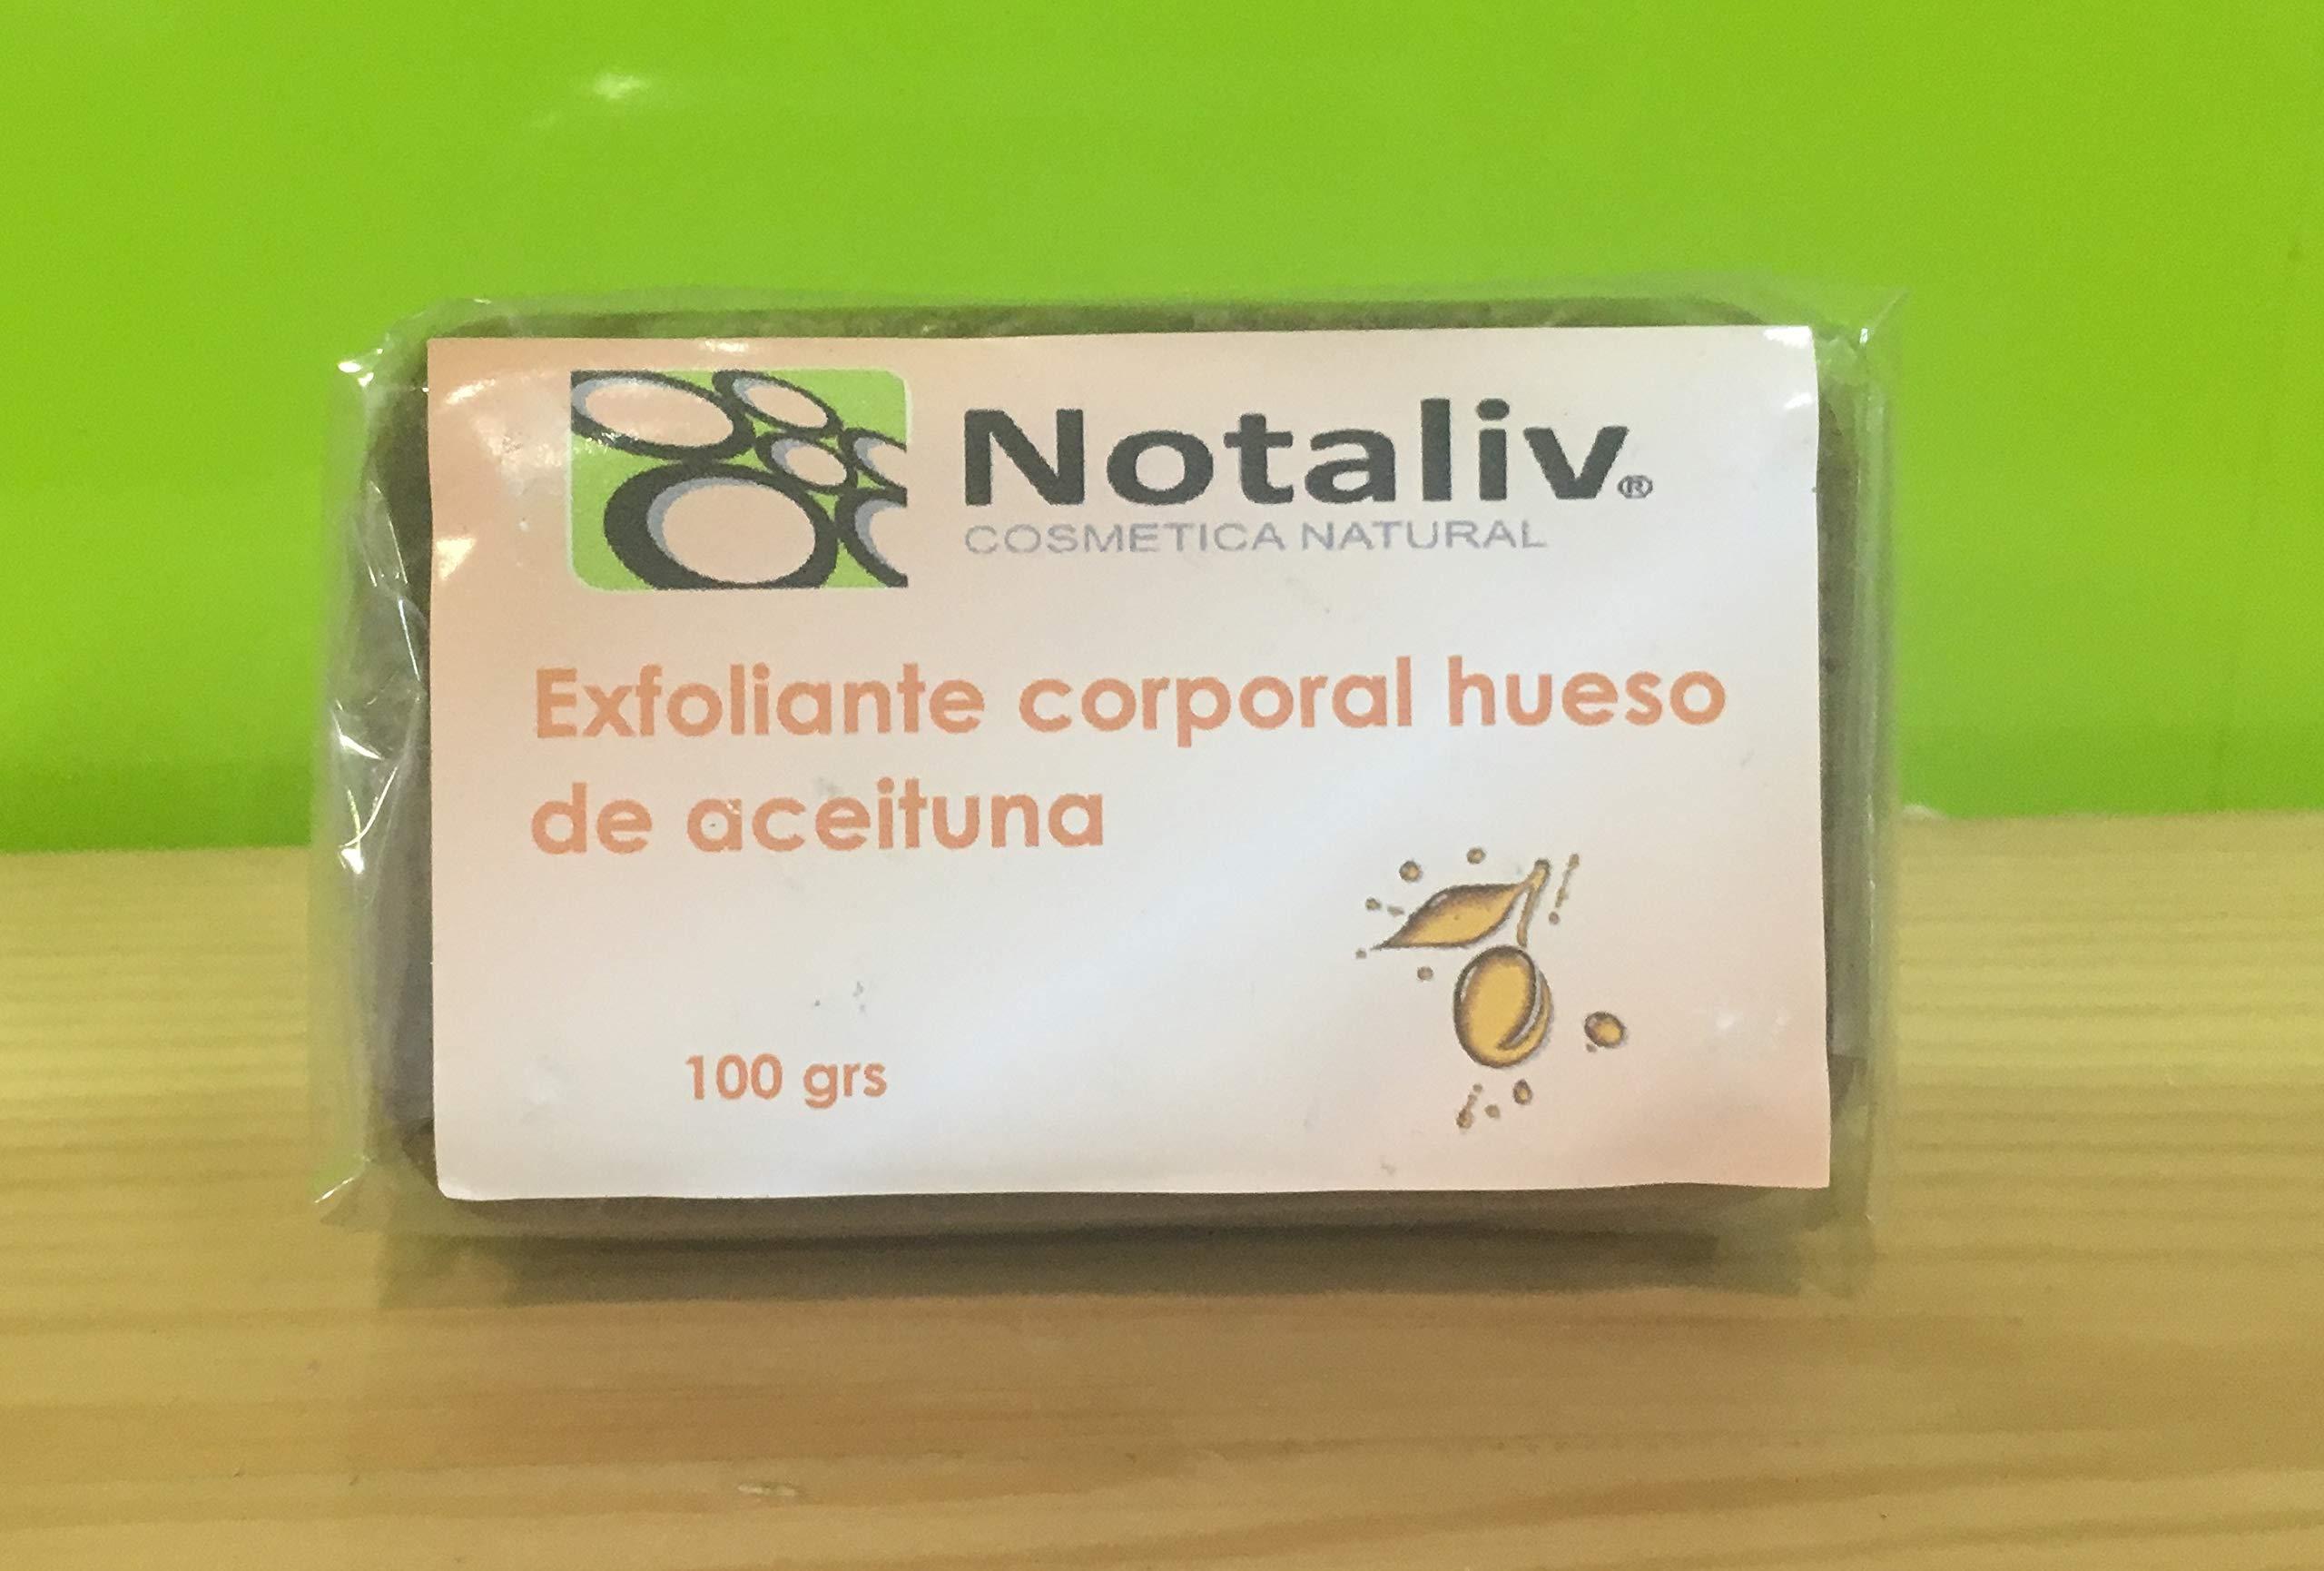 Notaliv Cosmética Natural Jabón exfoliante corporal hueso aceituna – 100g